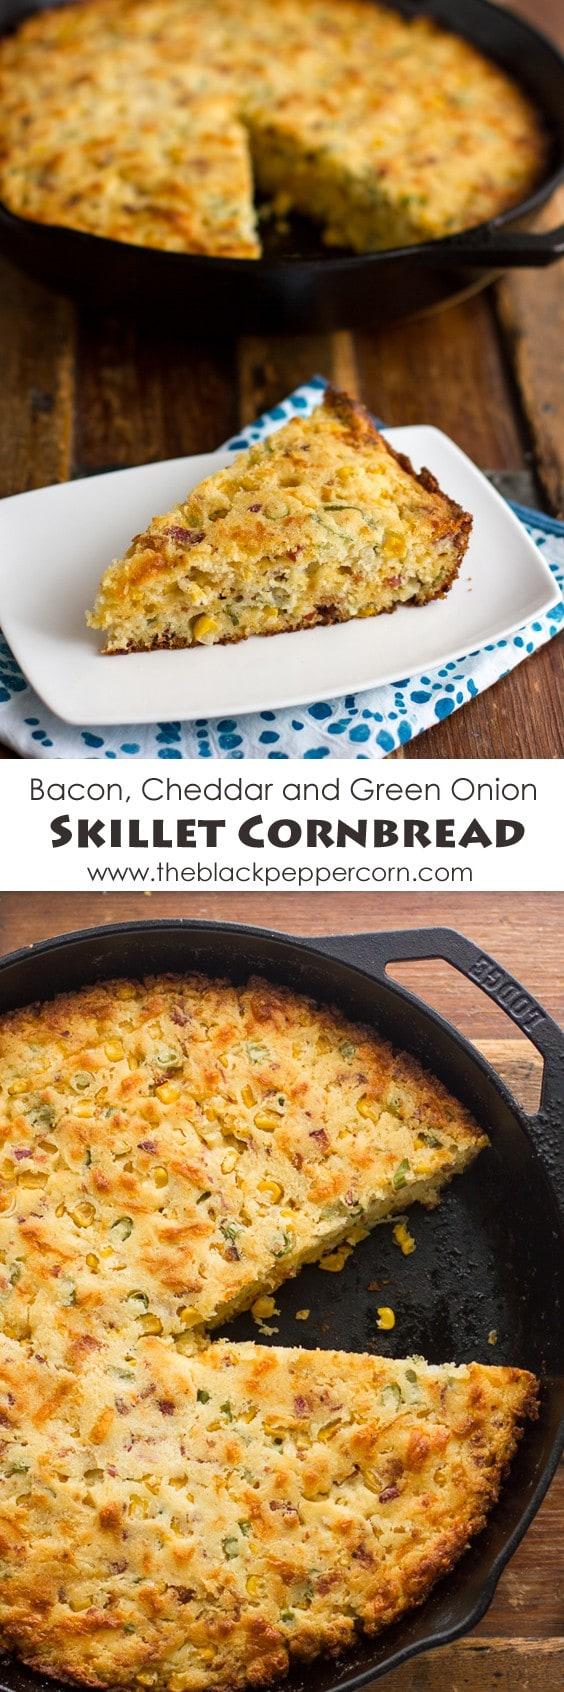 Bacon Cheddar and Green Onion Skillet Cornbread